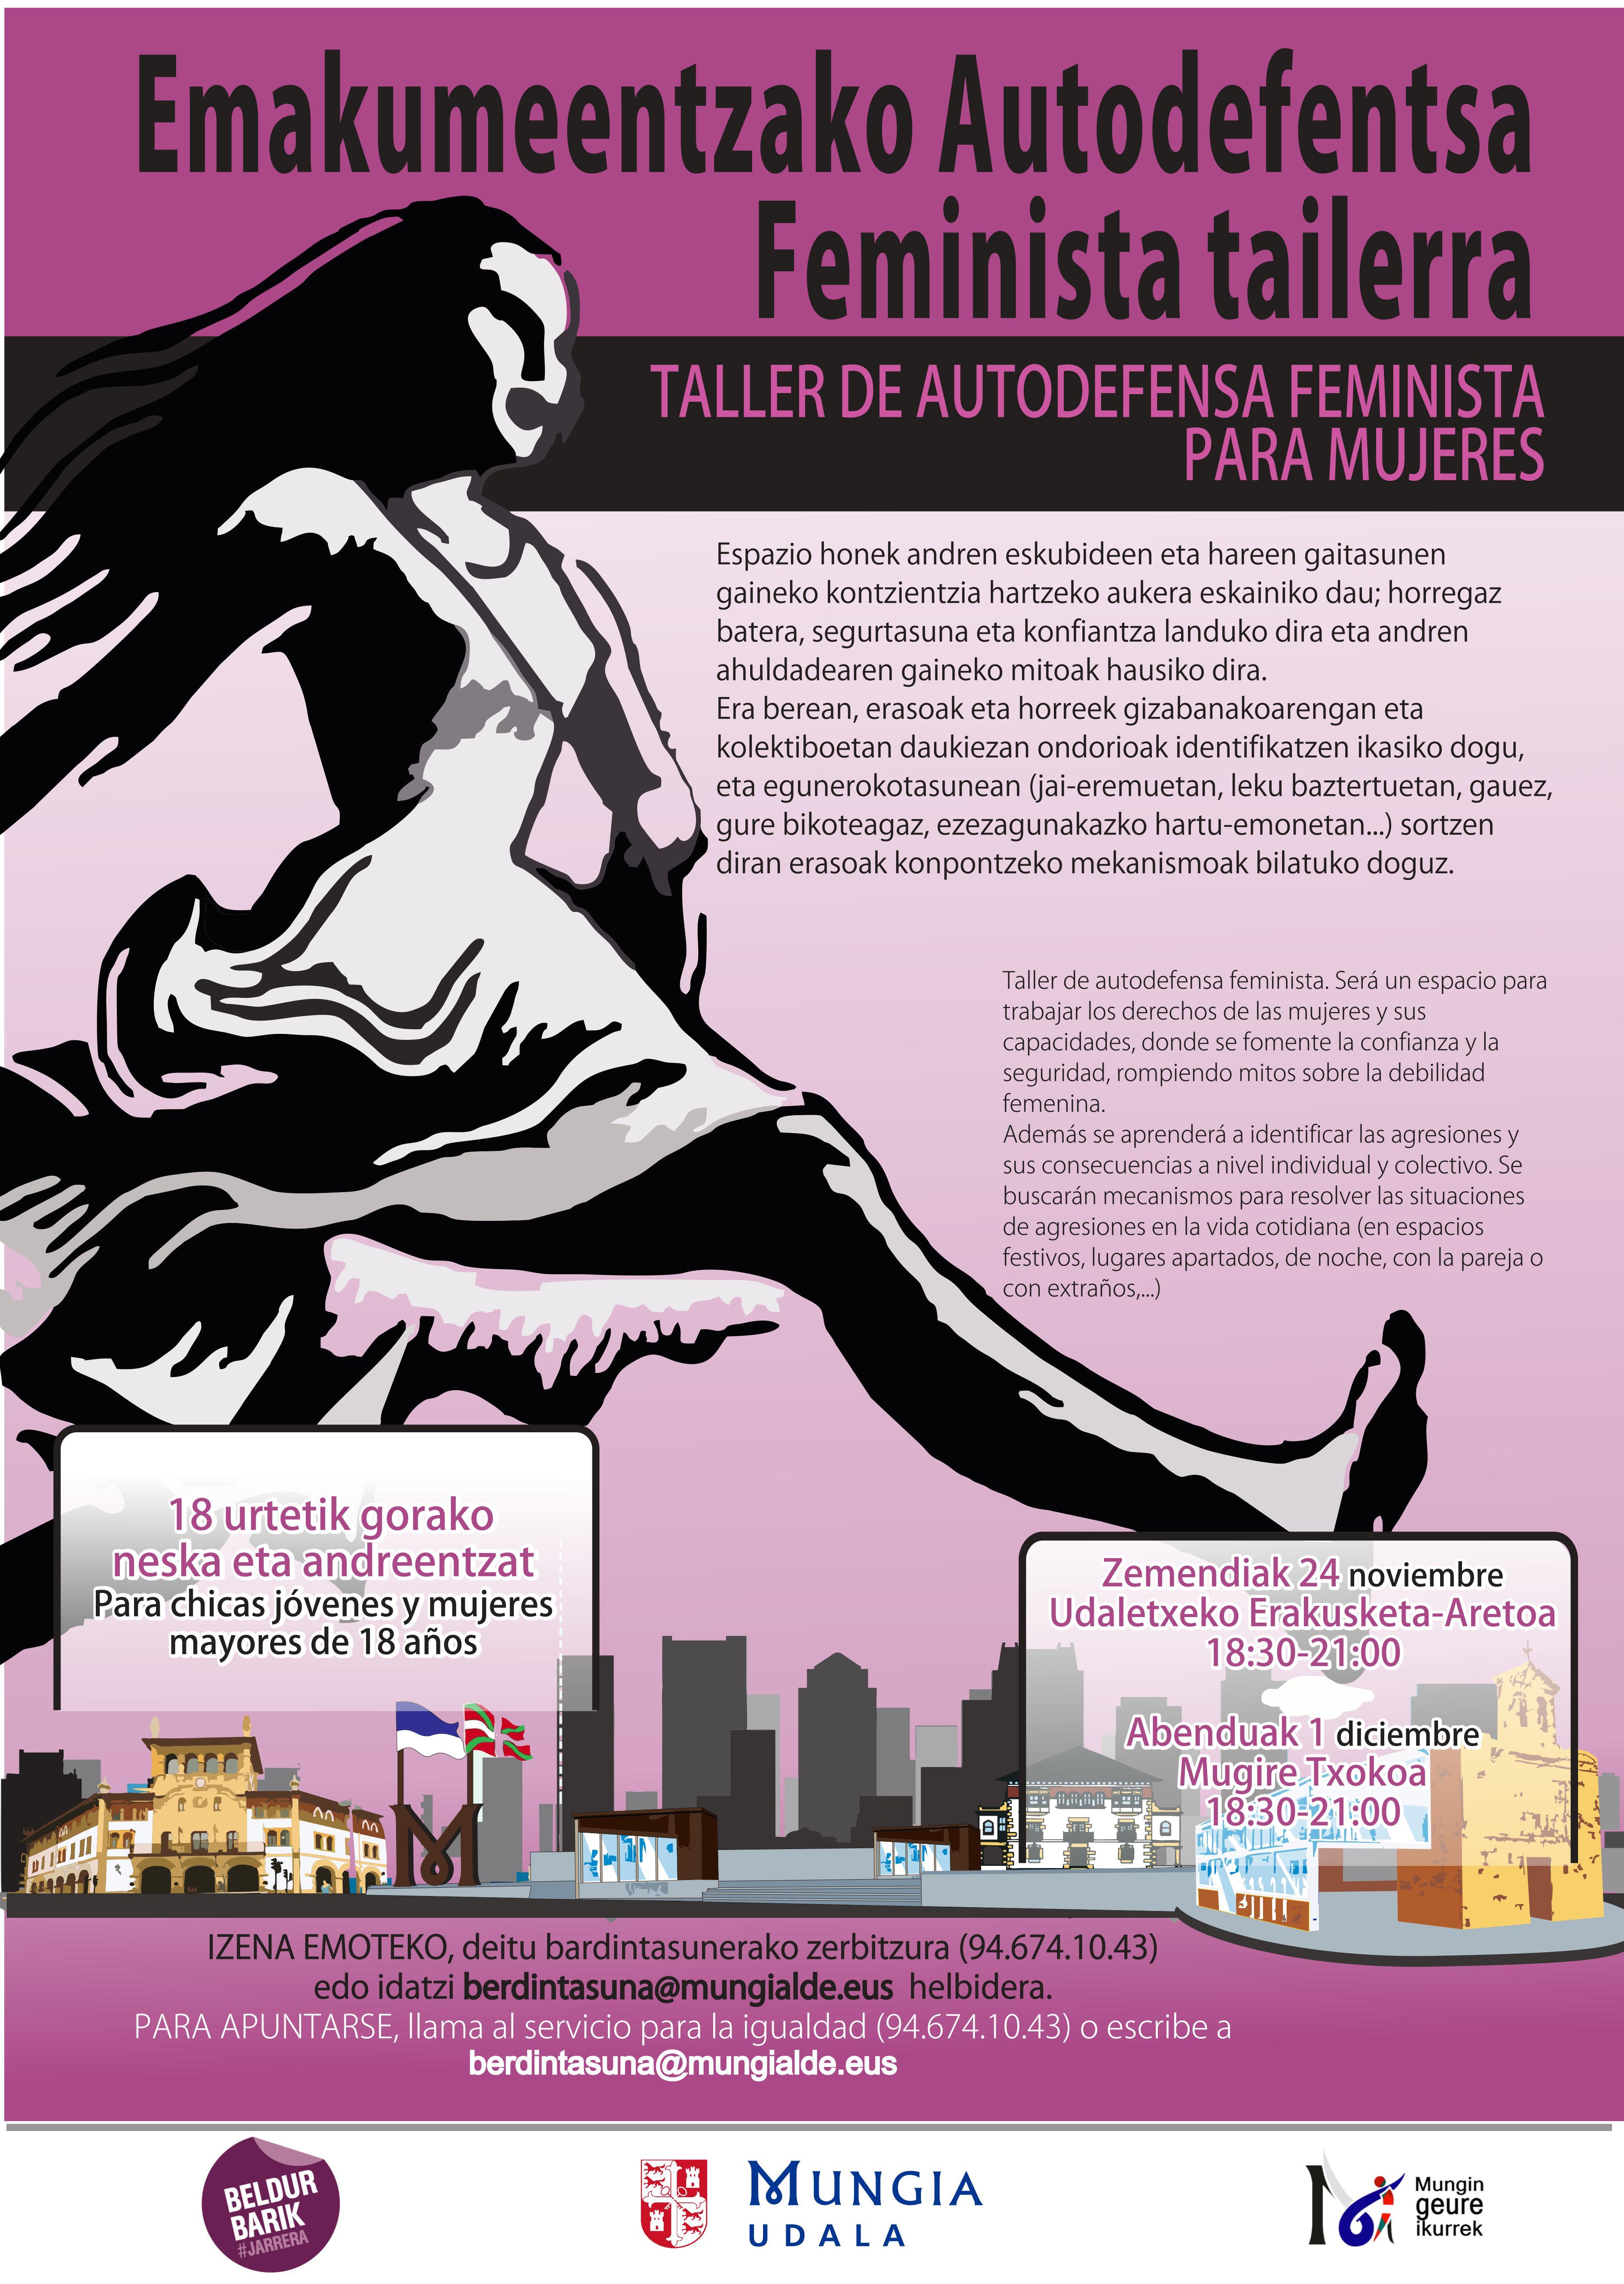 TALLER PARA AUTODEFENSA FEMINISTA EN MUNGIA